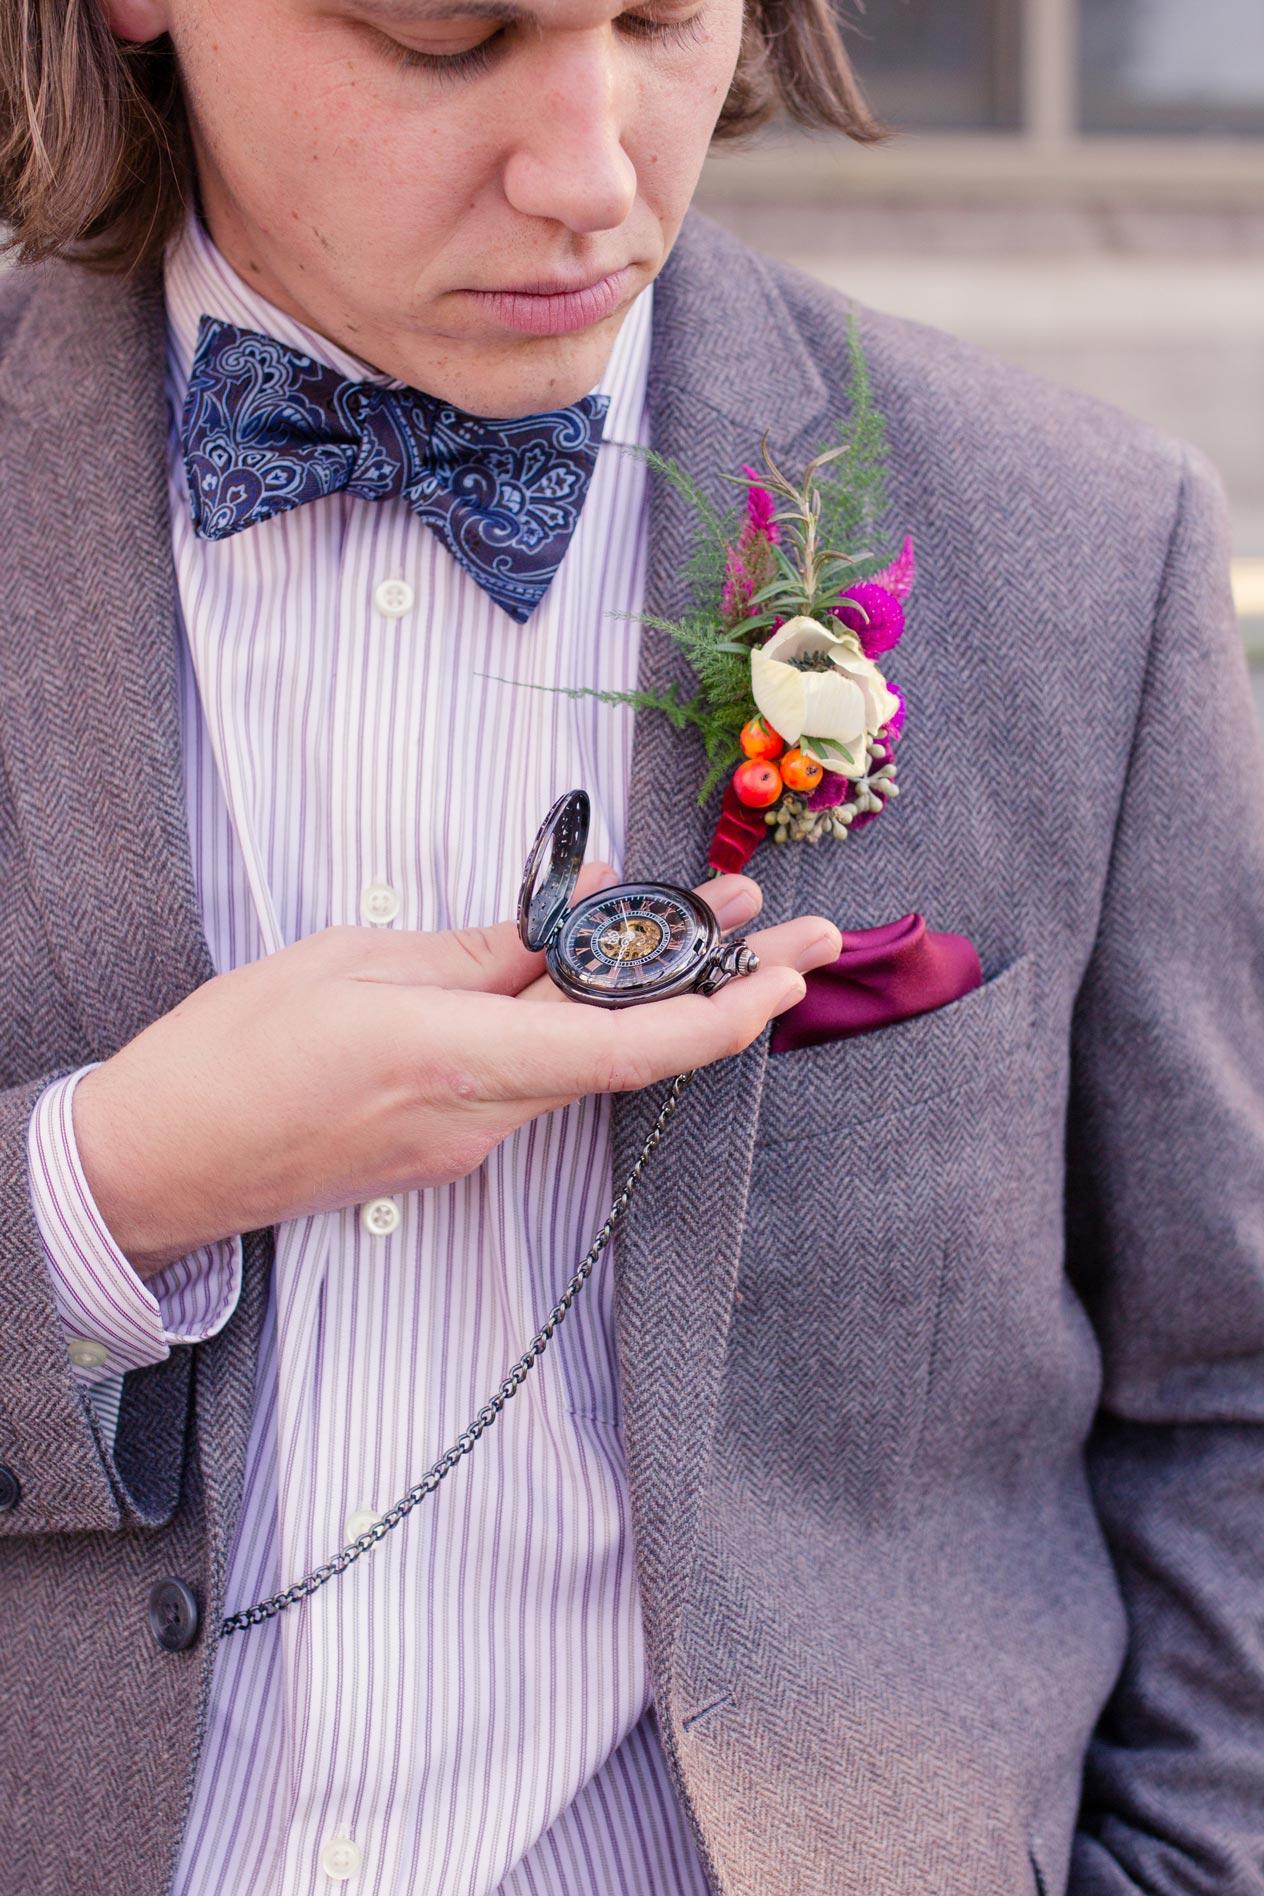 Rustic-Whimsical-Wedding- Tulsa-Wedding-FloristRobyns-Flower-Garden_Mallory-Hall-Photography15.jpg